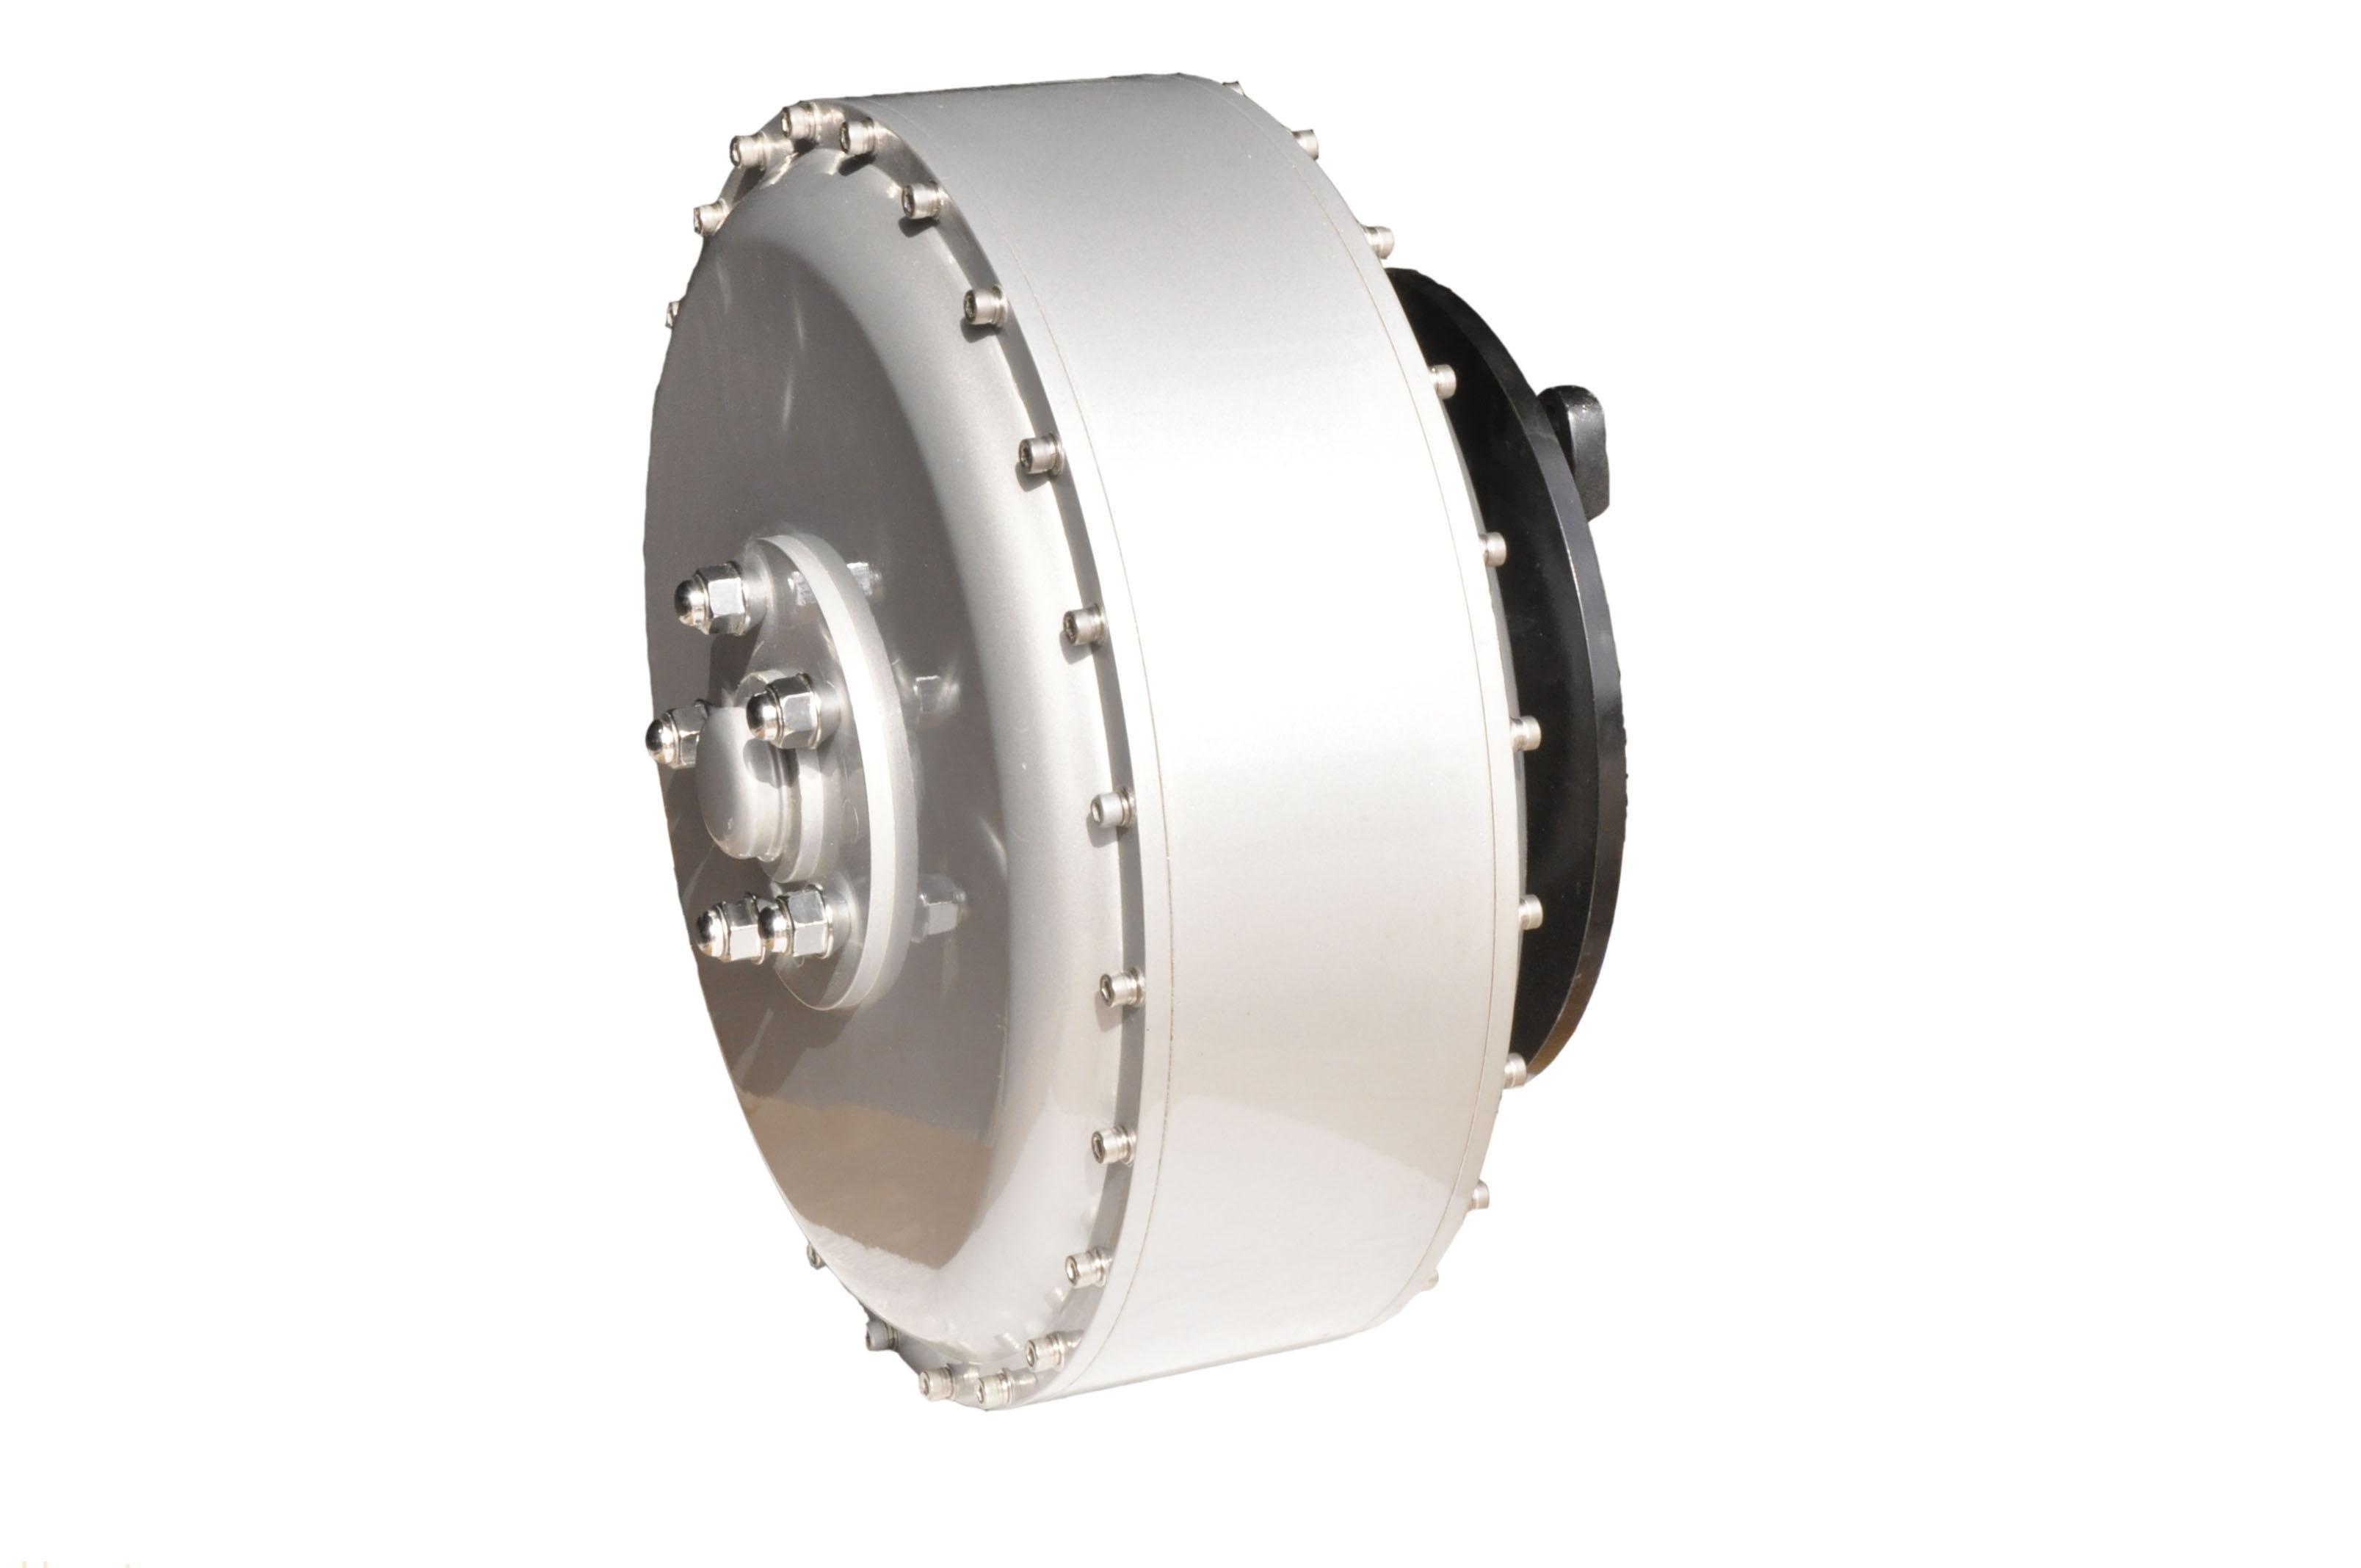 YT-354ZWG-3-10/264智能变挡永磁无刷中置电机是专为轻便型纯电动汽车及混合动力汽车而设计,具有转矩大、转速范围宽、智能变速等诸多特点,使用本电机作为动力,可以在不使用变速箱的情况下达到汽车行驶的动力指标,从而使得电动车的生产和制造更方便,成本更节约。 YT-354ZWG-3-10/264智能变挡永磁无刷中置电机具有3C认证,参数符合国标GB/T21418的规定,安全可靠。 产品参数: 项目: 一档 二档 三档 额定电压: 264V 额定功率: 5.